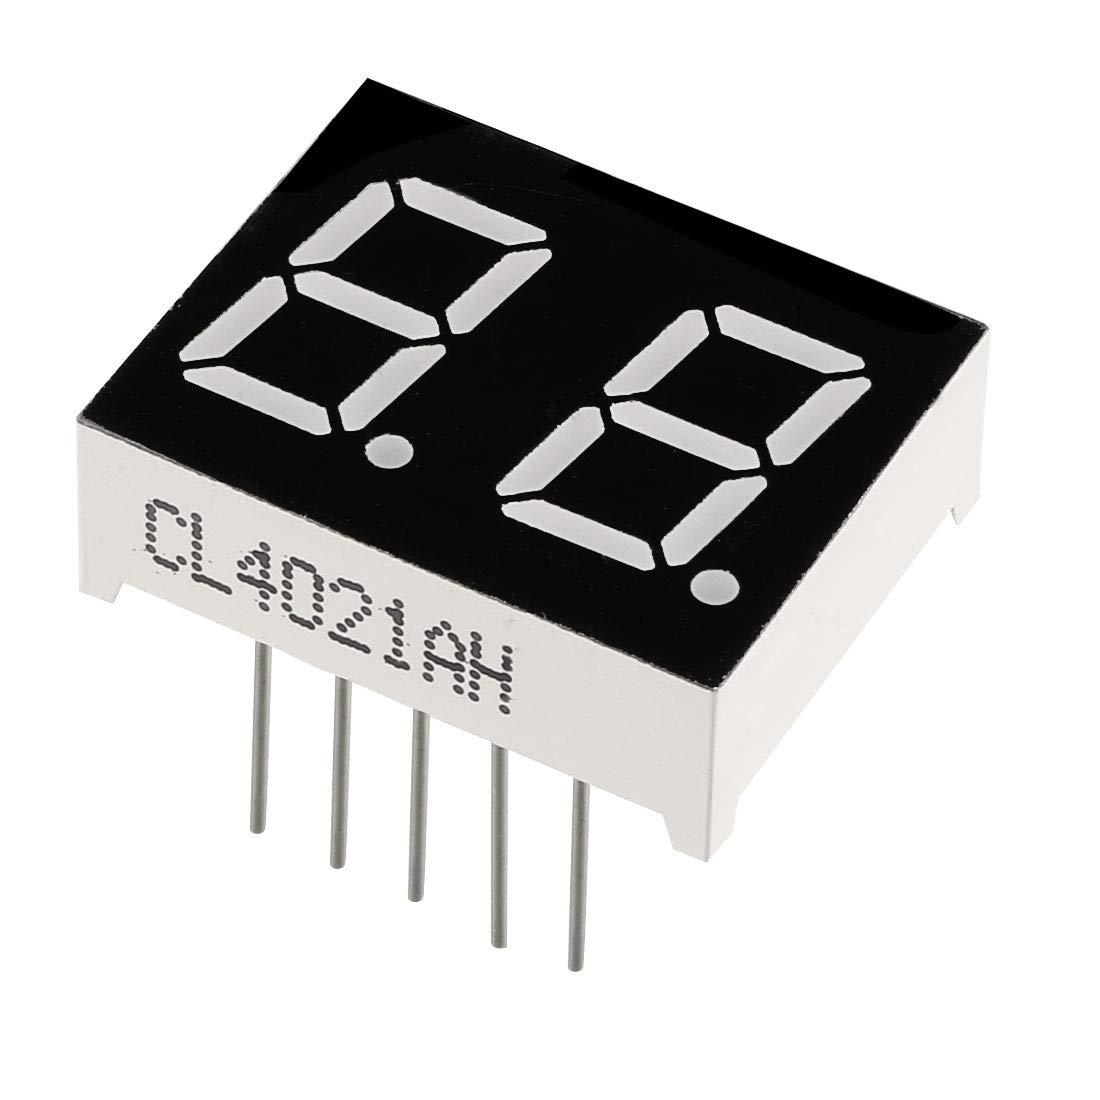 "Common Cathode 12 Pin 4 Bit 1.18 x 0.55 x 0.28 Inch 0.35/"" Red LED Display 5pcs"